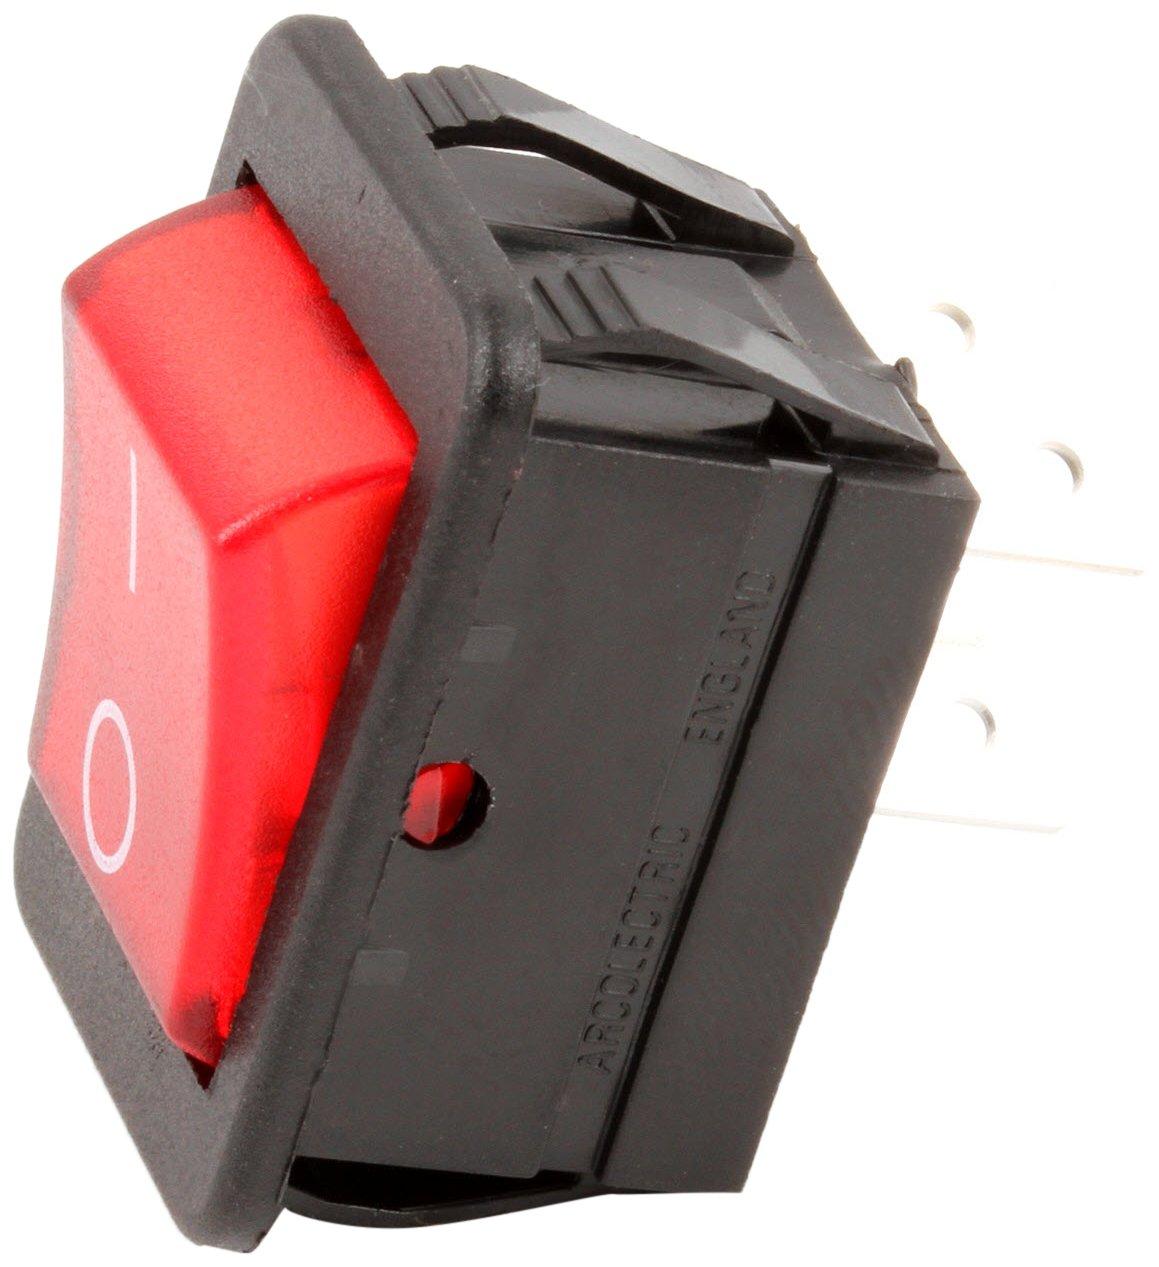 16A//125-250V Red Grindmaster Cecilware L155A Rocker Switch